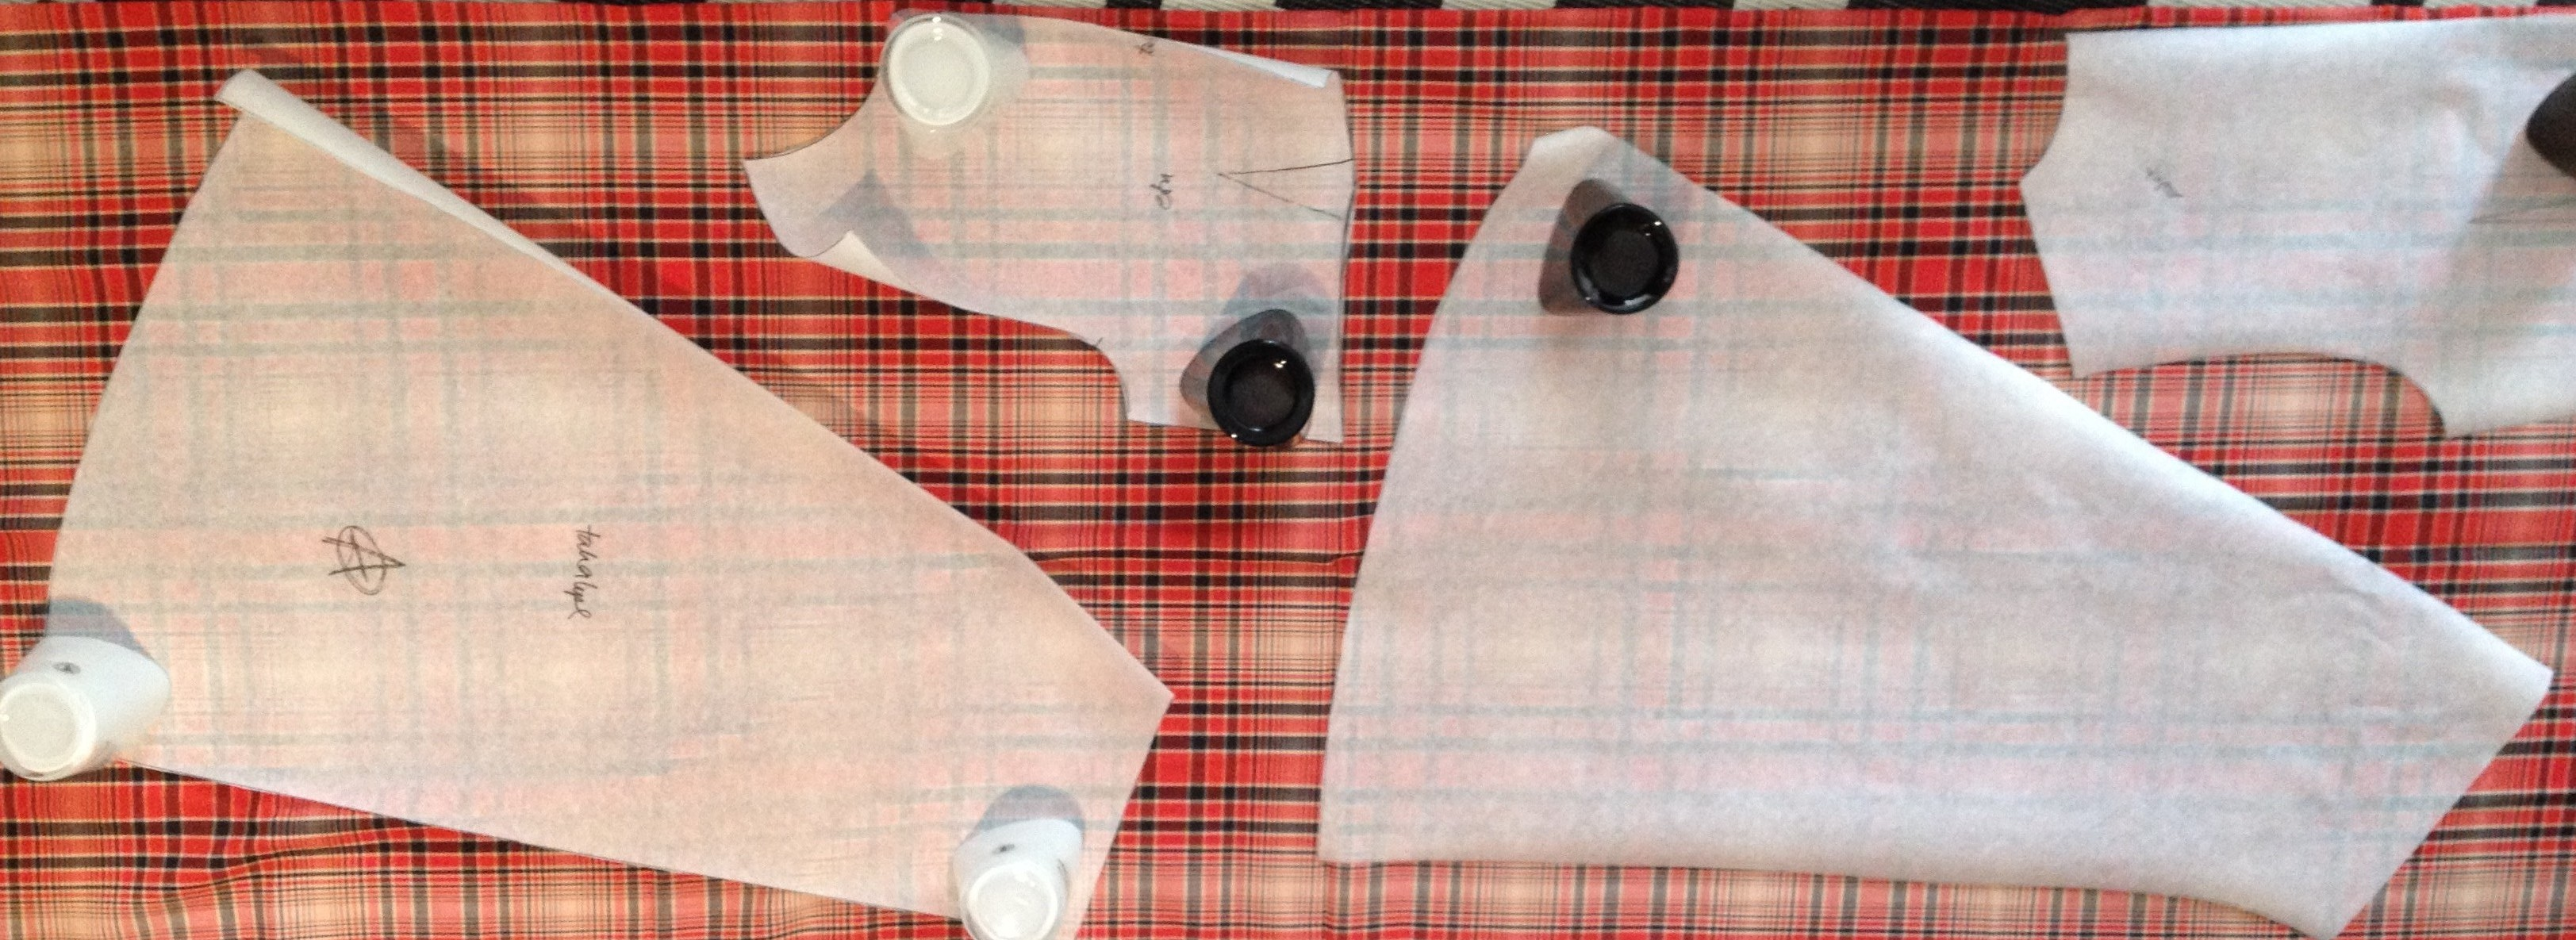 laying dress patterns on checkered fabric